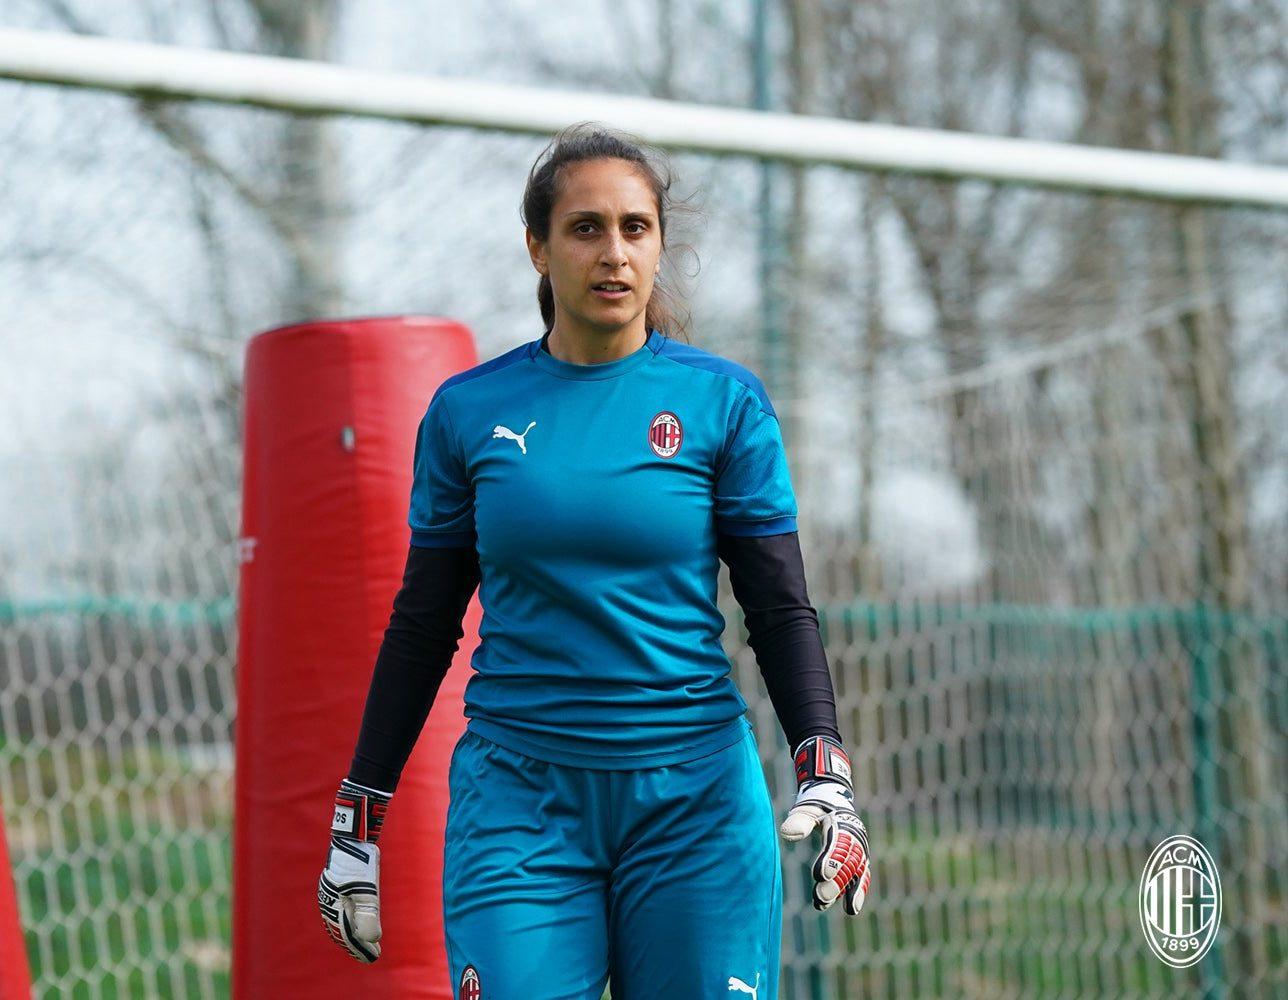 Alessia Piazza bids farewell to AC Milan on social media